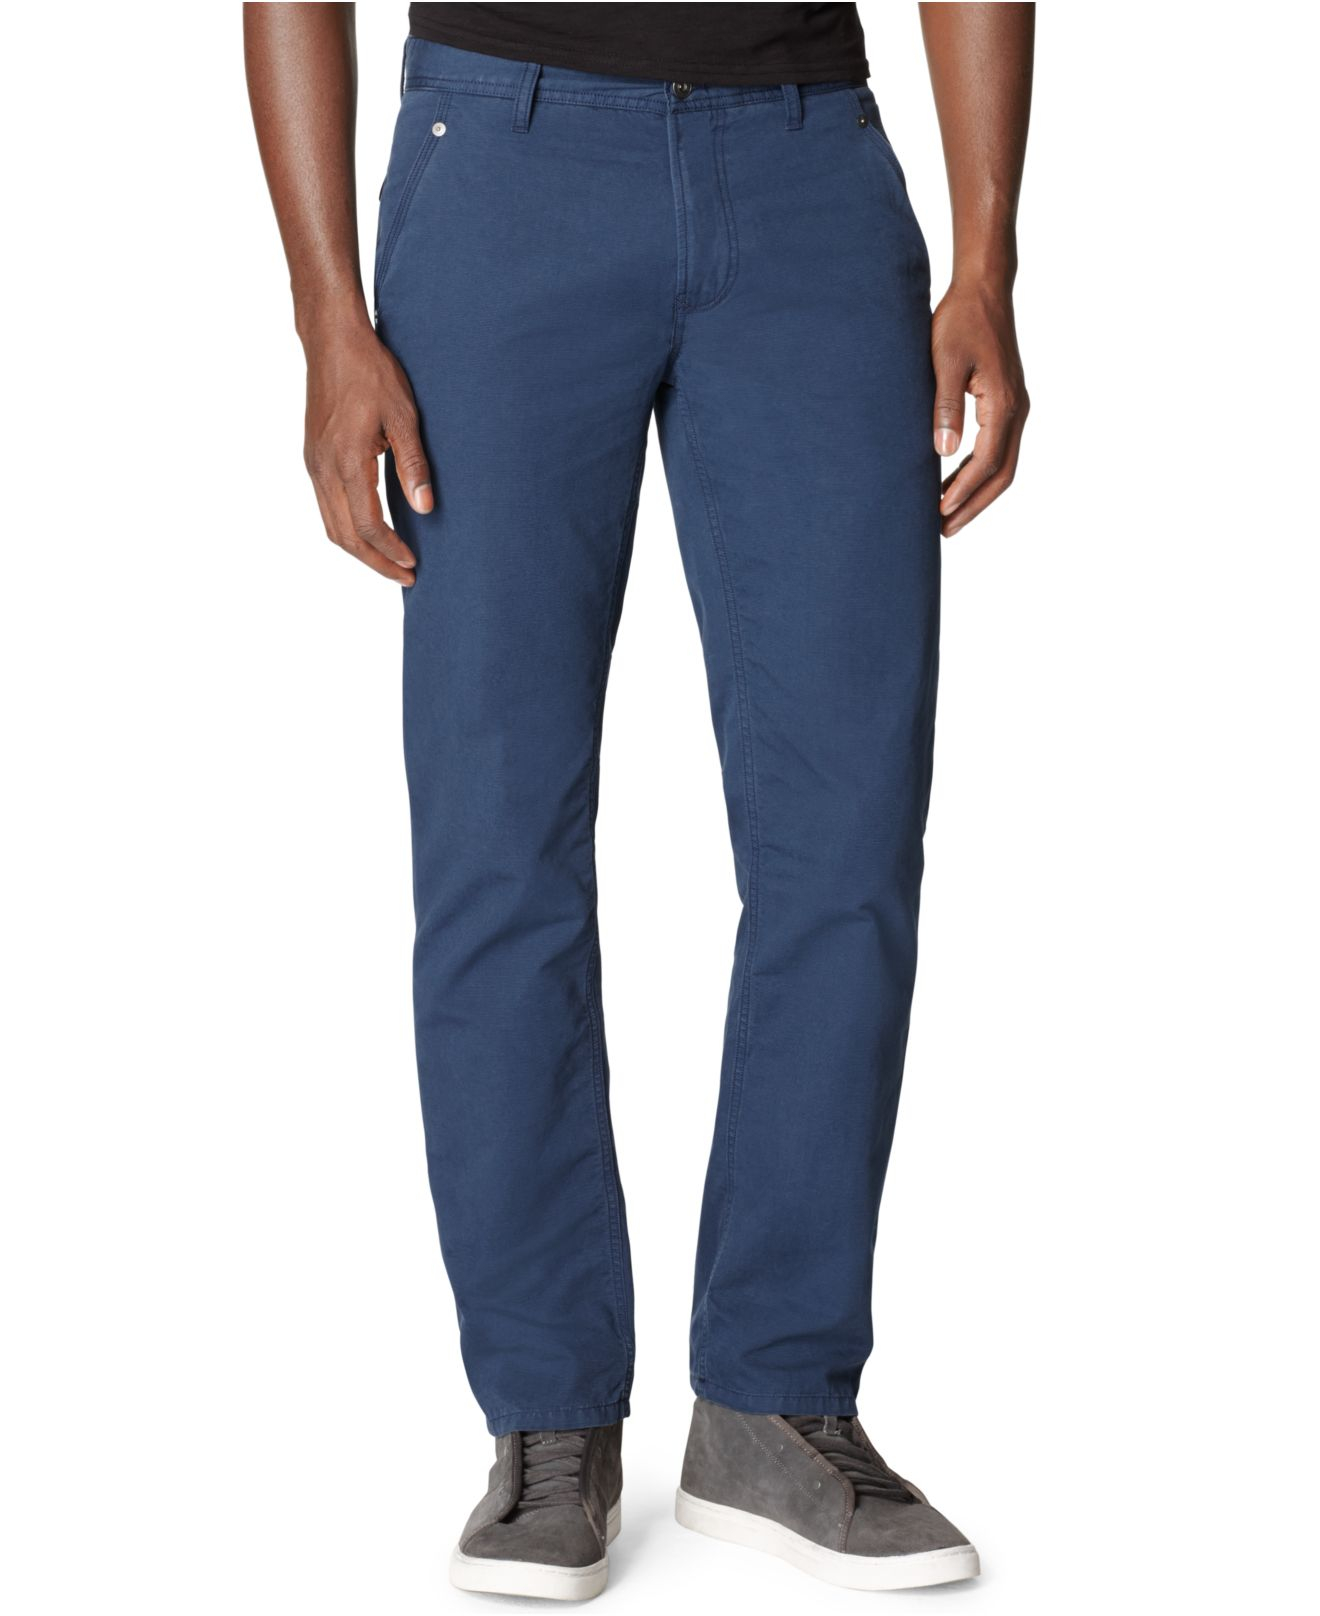 calvin klein jeans slim straight pants in blue for men lyst. Black Bedroom Furniture Sets. Home Design Ideas